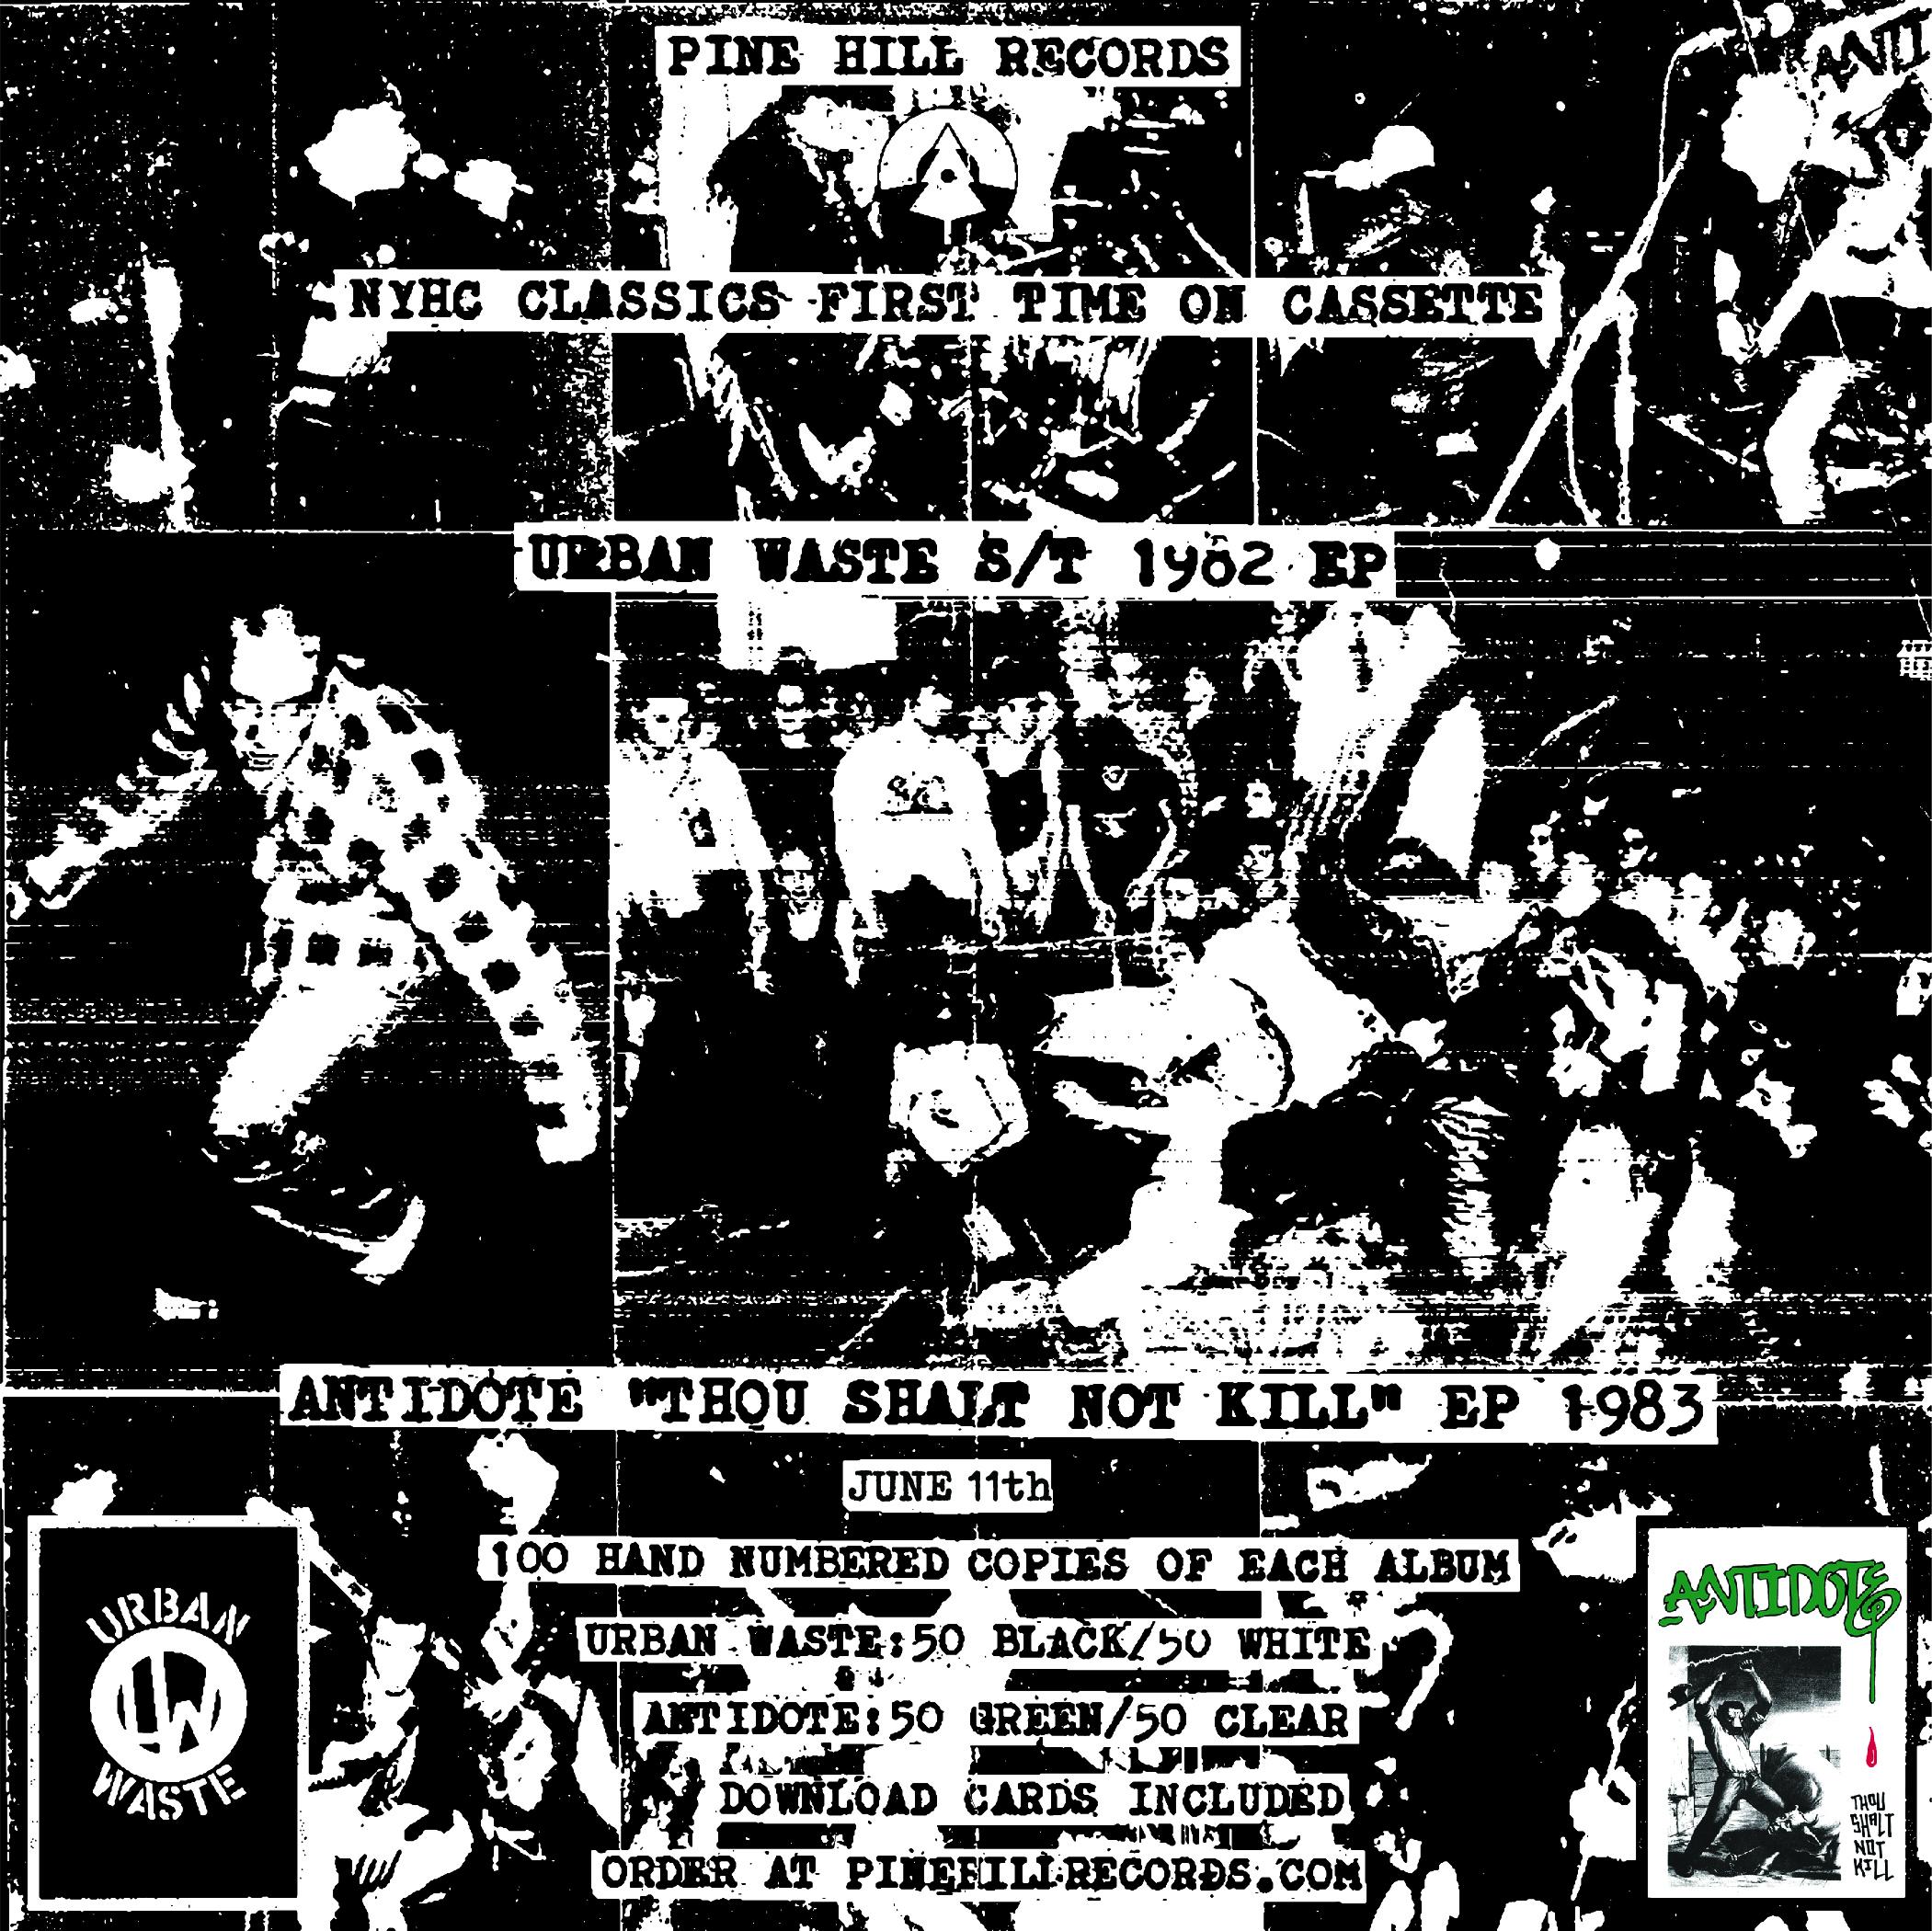 Pine Hill Records - Double cassette reissue